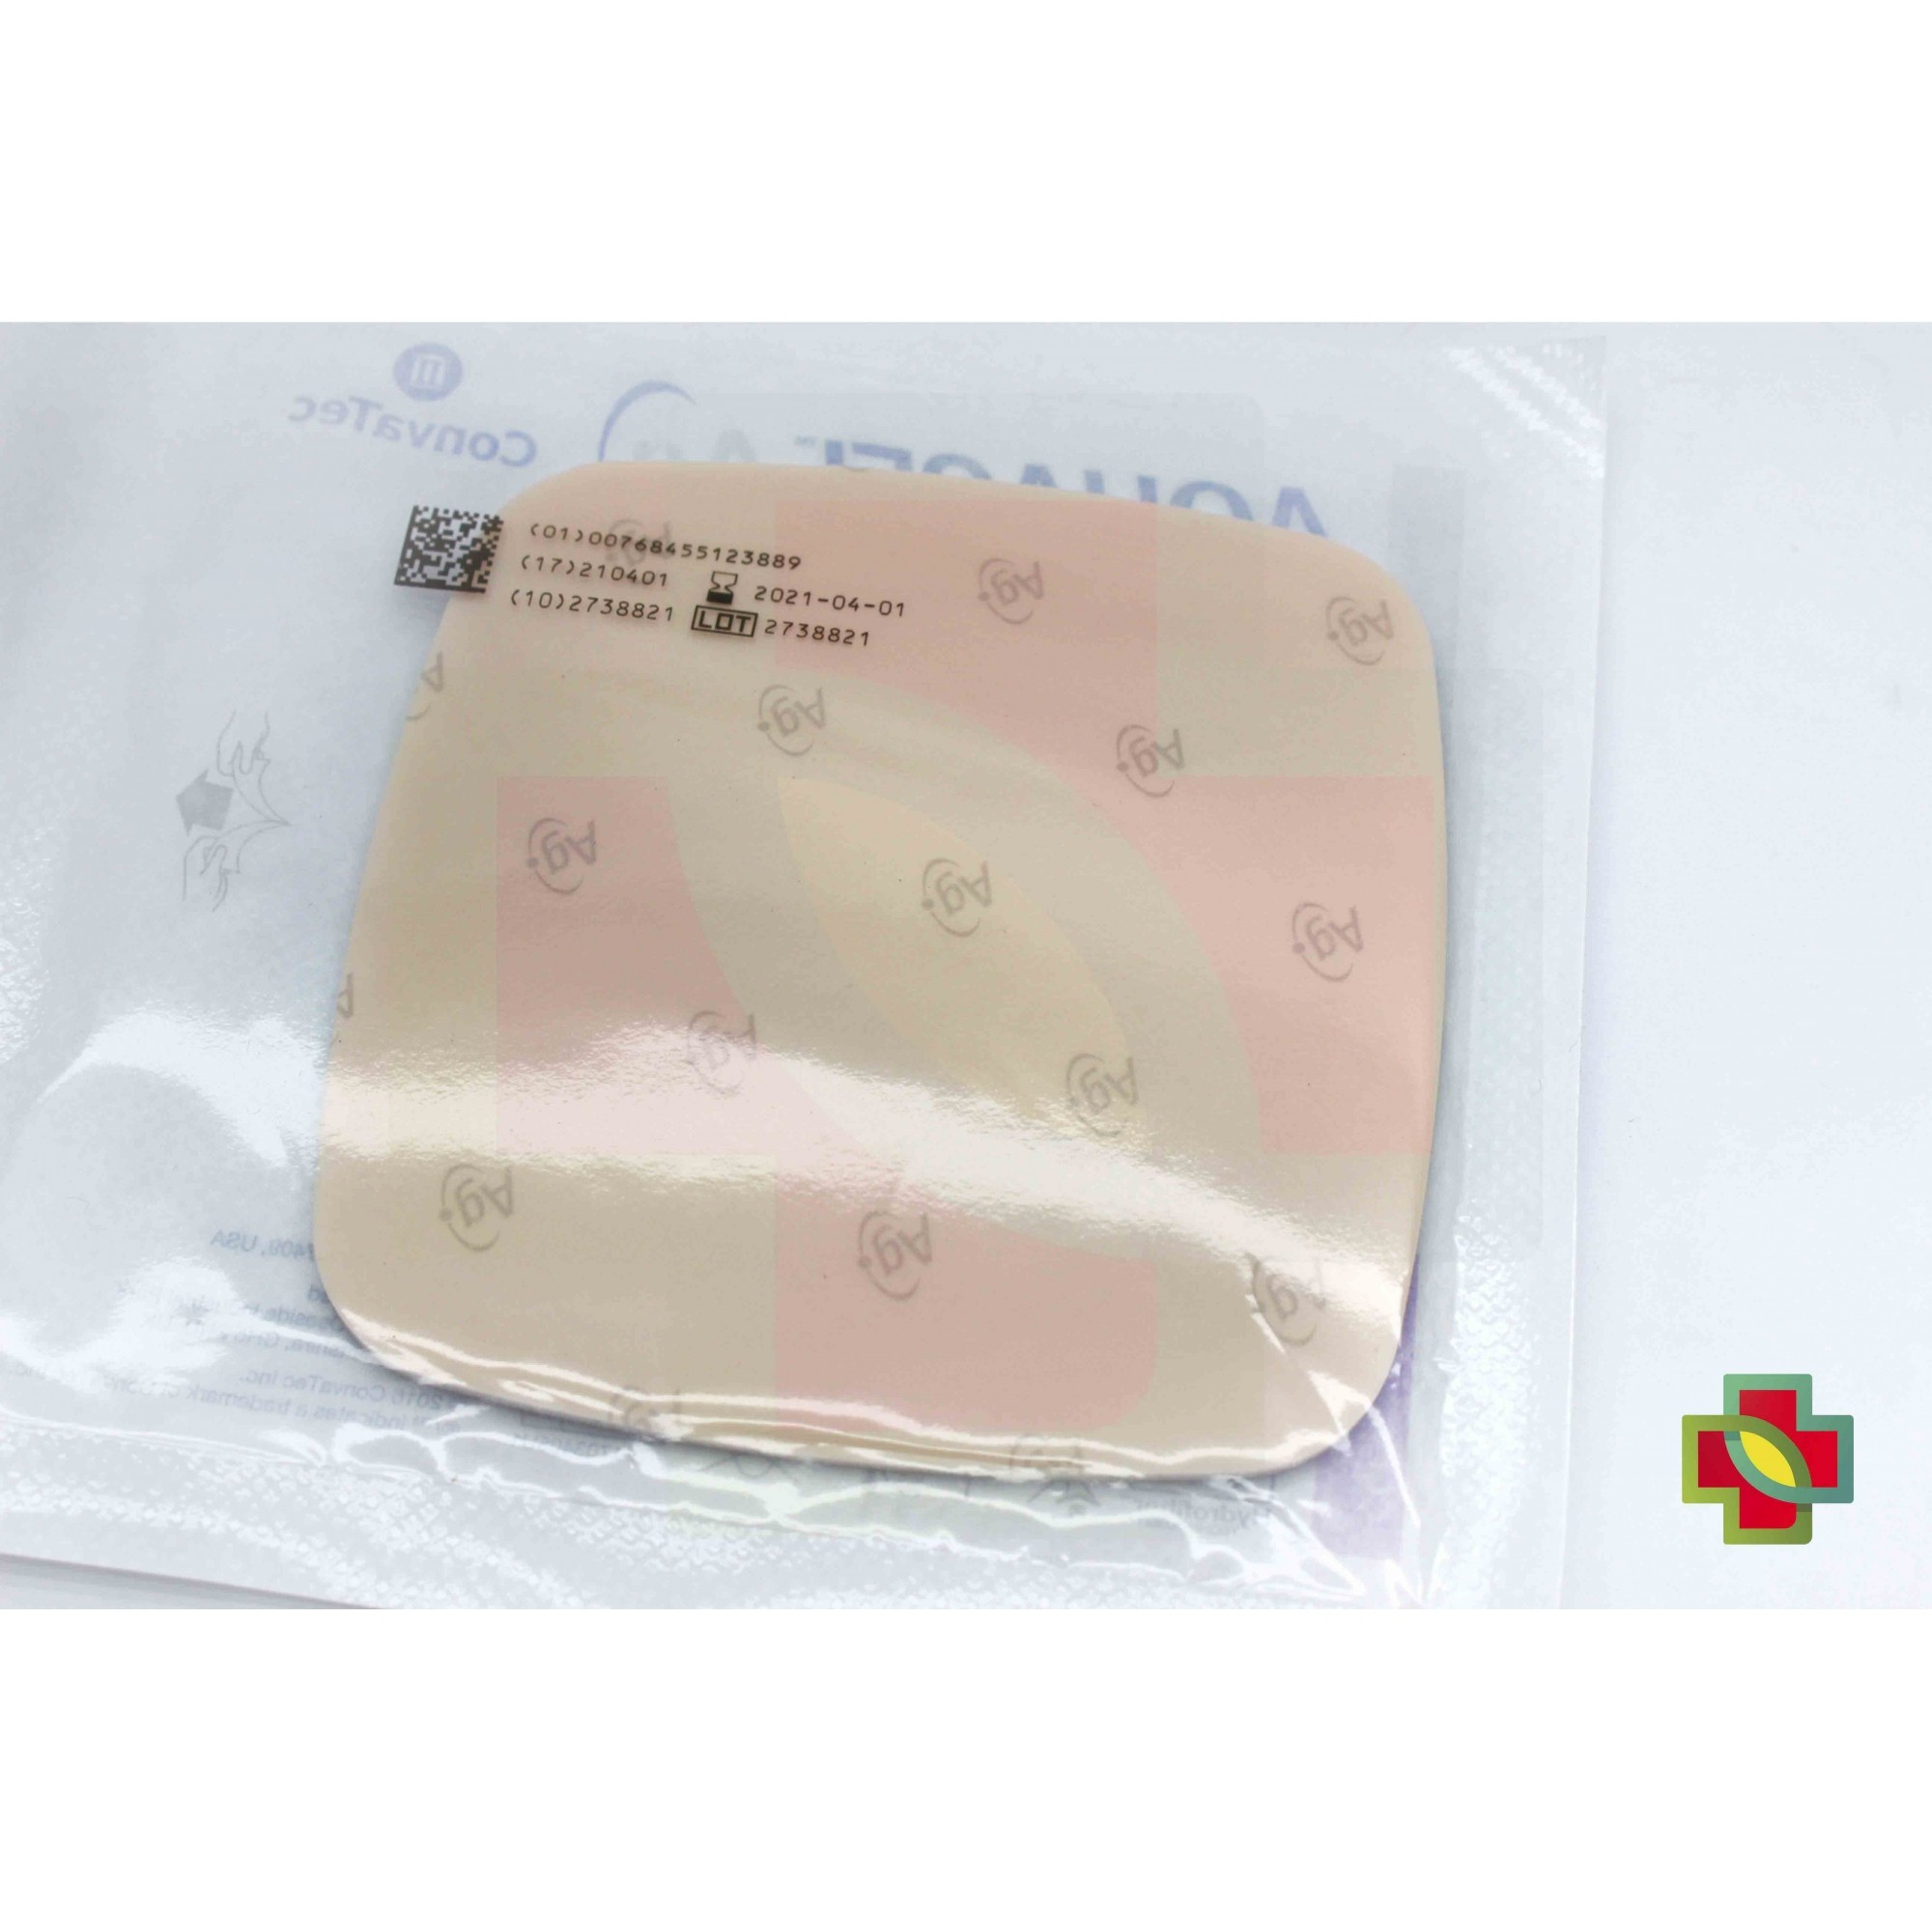 CURATIVO AQUACEL AG FOAM SEM ADESIVO 10 X 10 UND. 420642 CONVATEC